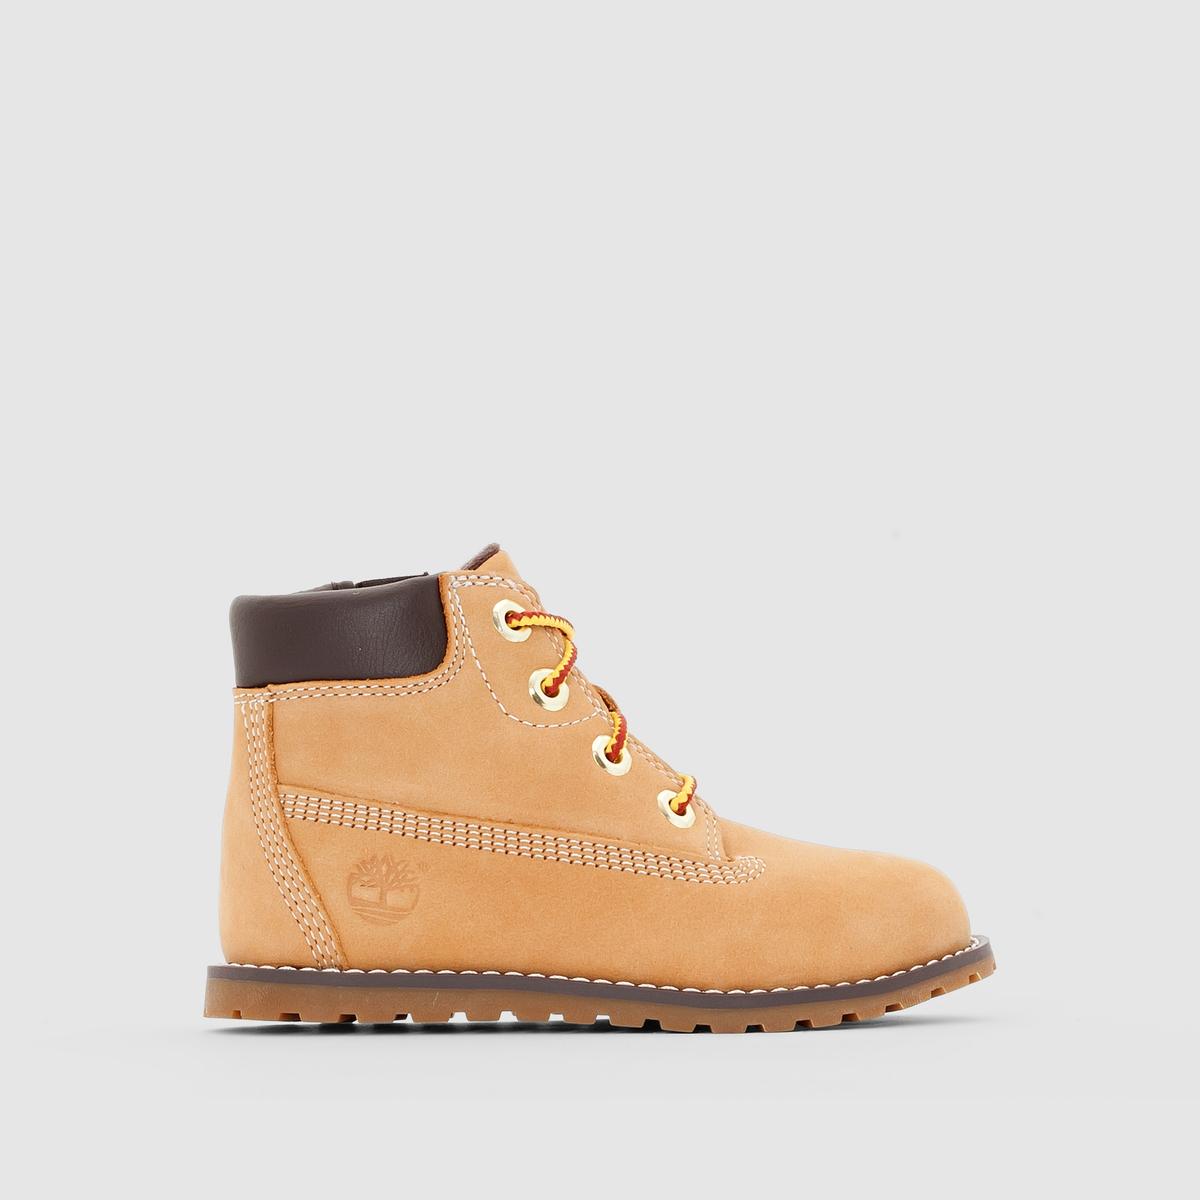 Timberland Pokey Pine 6-inch Boots A125Q Bruin-30 maat 30 online kopen